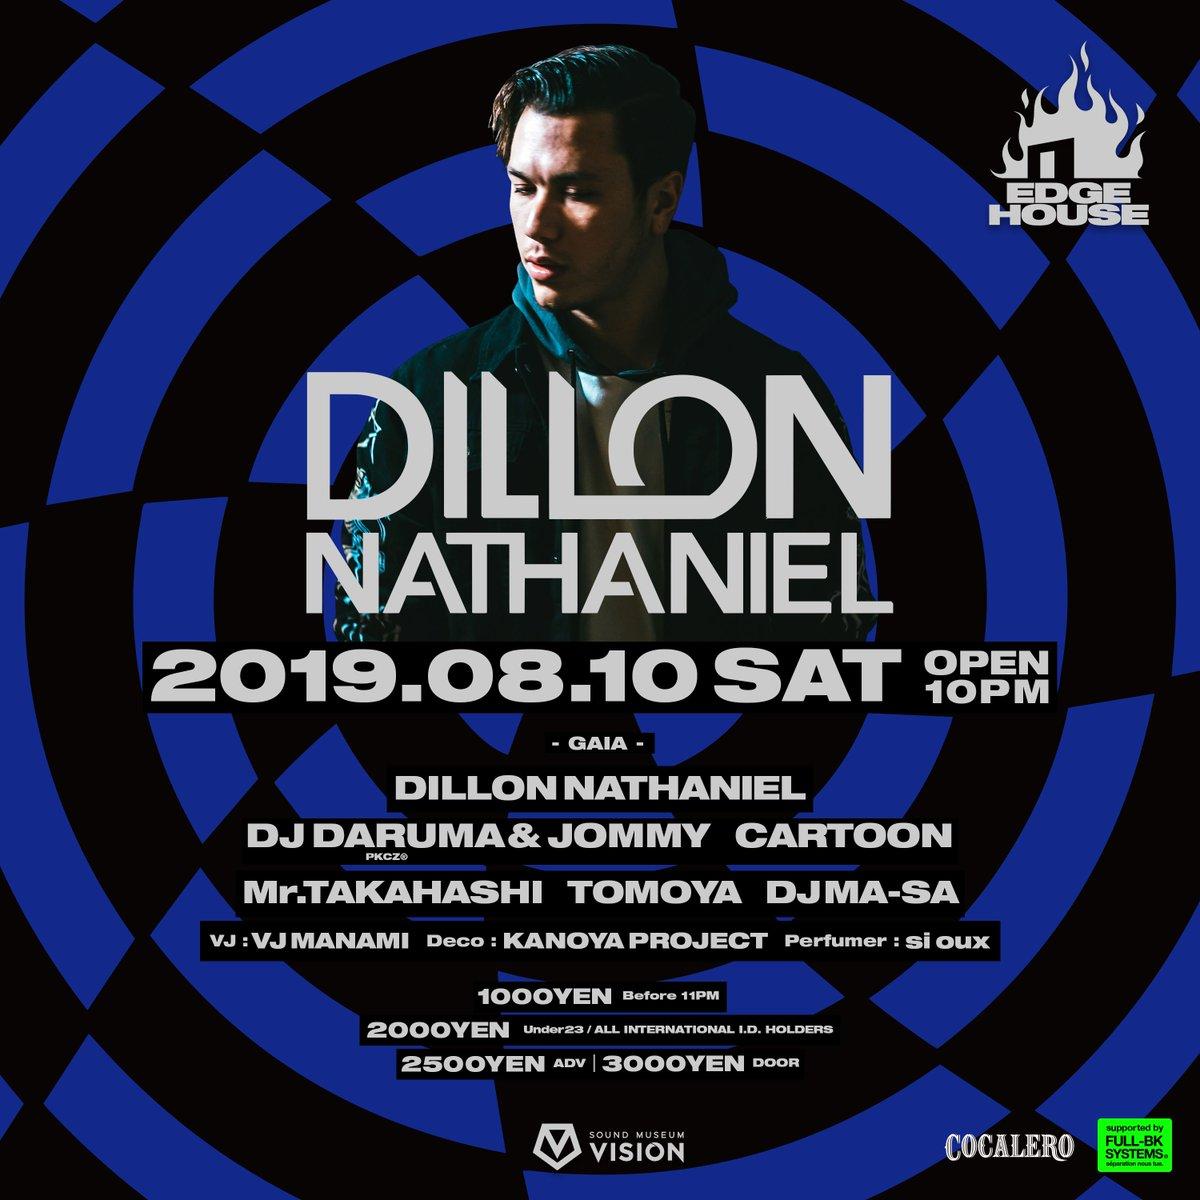 8/10 DILLON NATHANIEL EDGE HOUSE vision